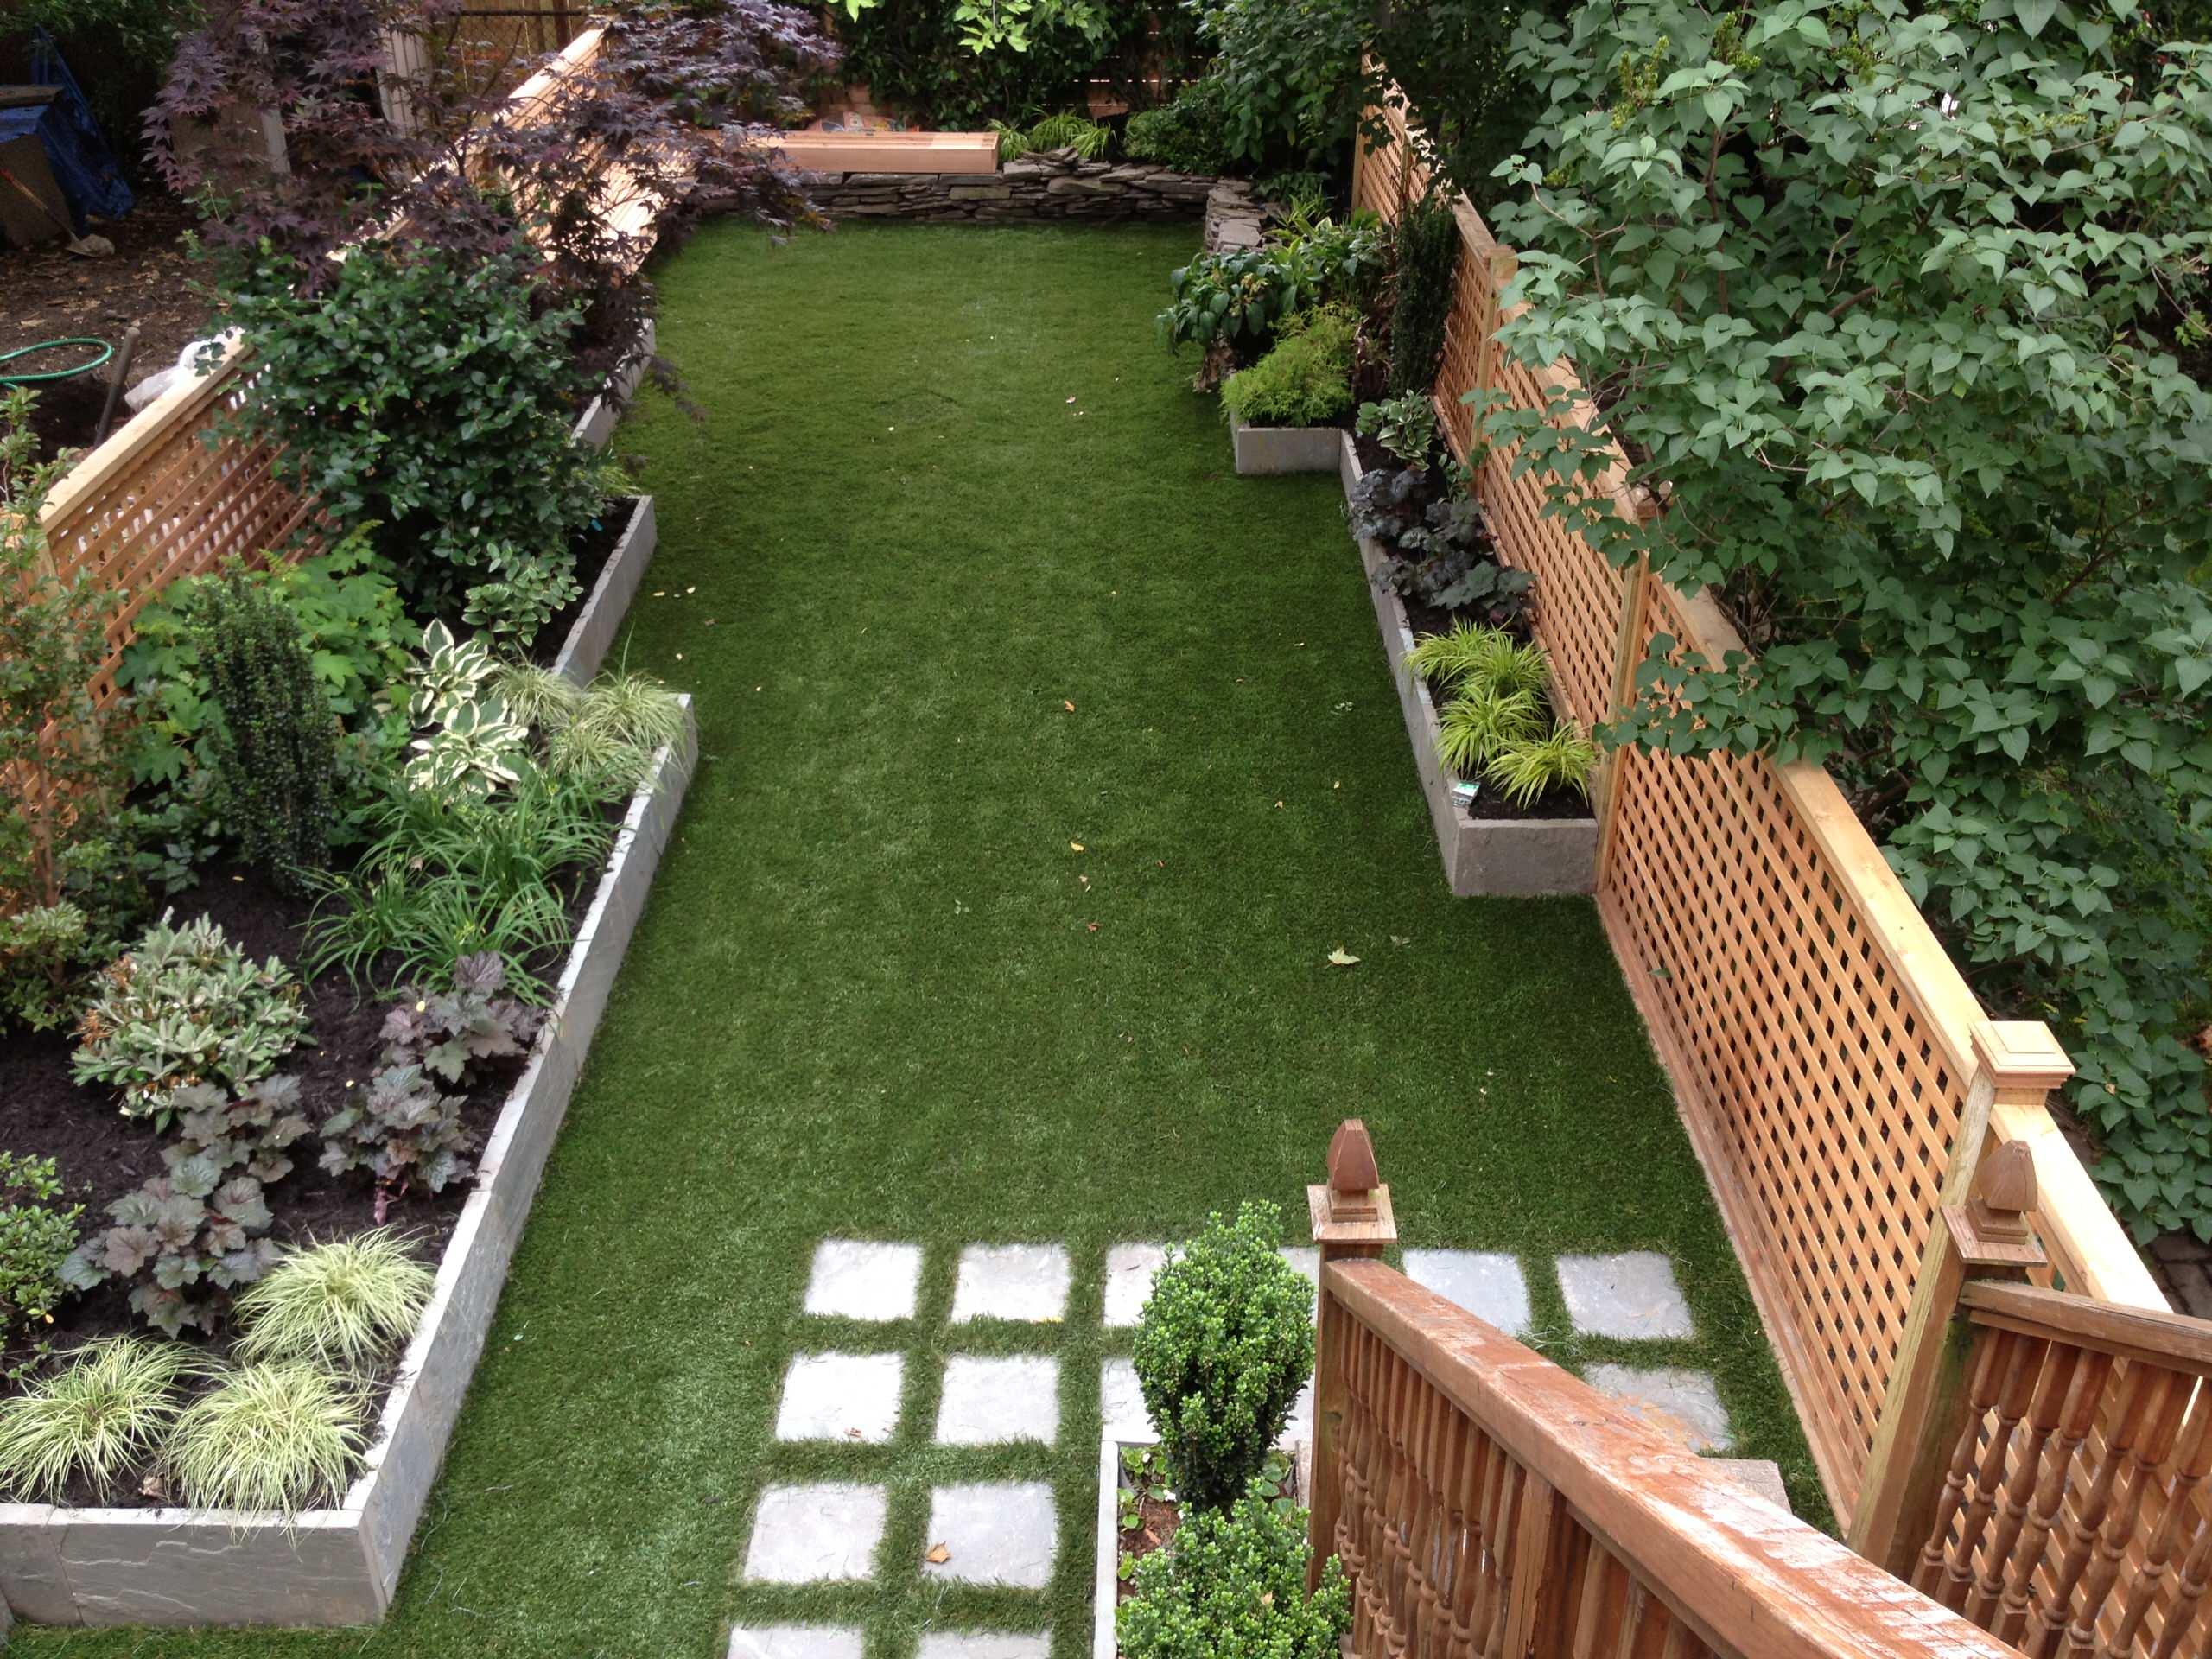 Geometrical garden with SynLawn grass